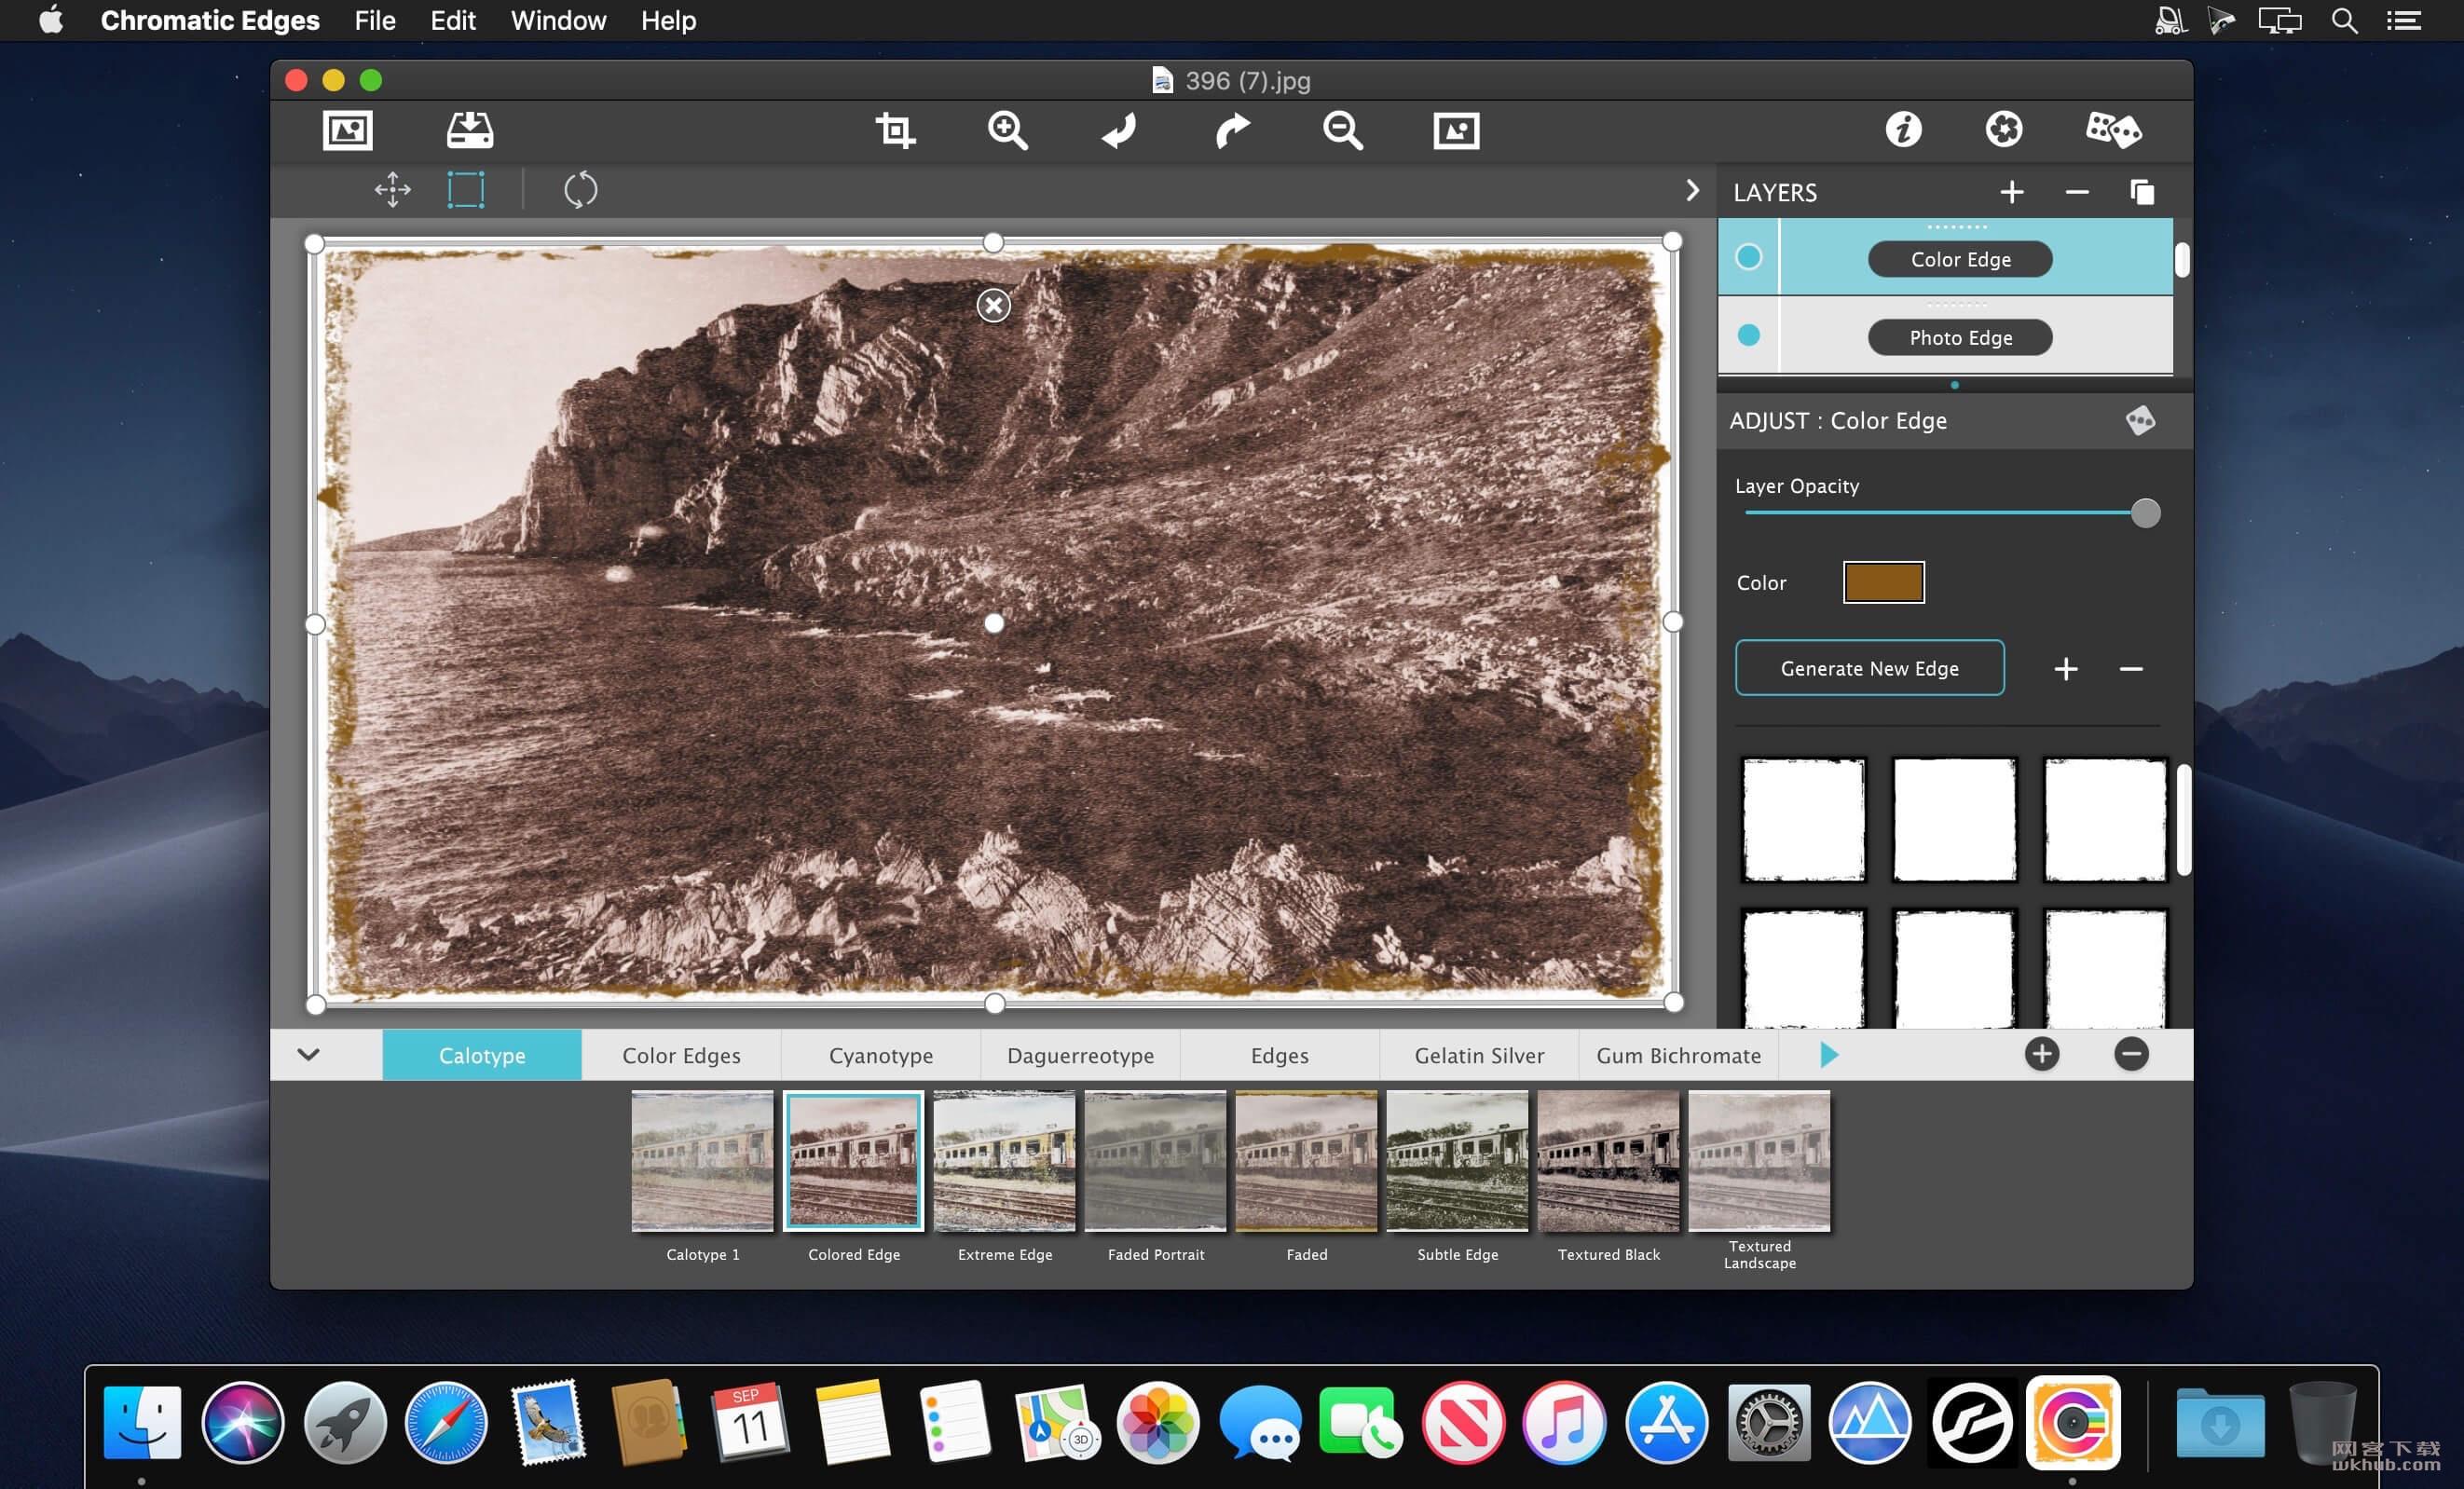 JixiPix Chromatic Edges 1.0.9 复古效果照片编辑软件